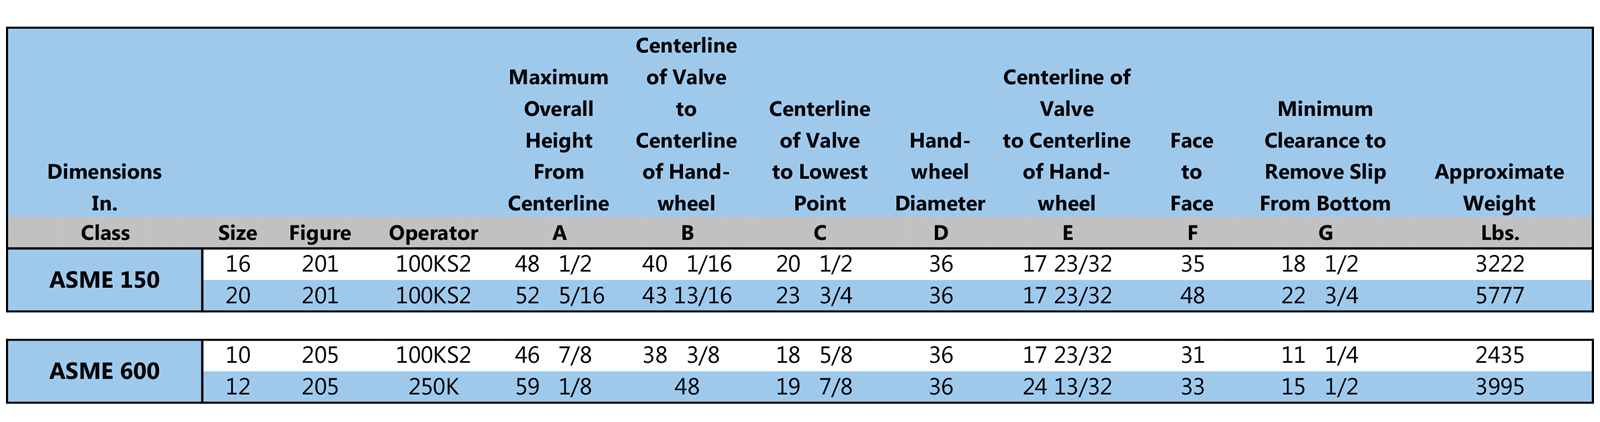 Dimenstionaldata Gearoperated Fullportpiggable Chart